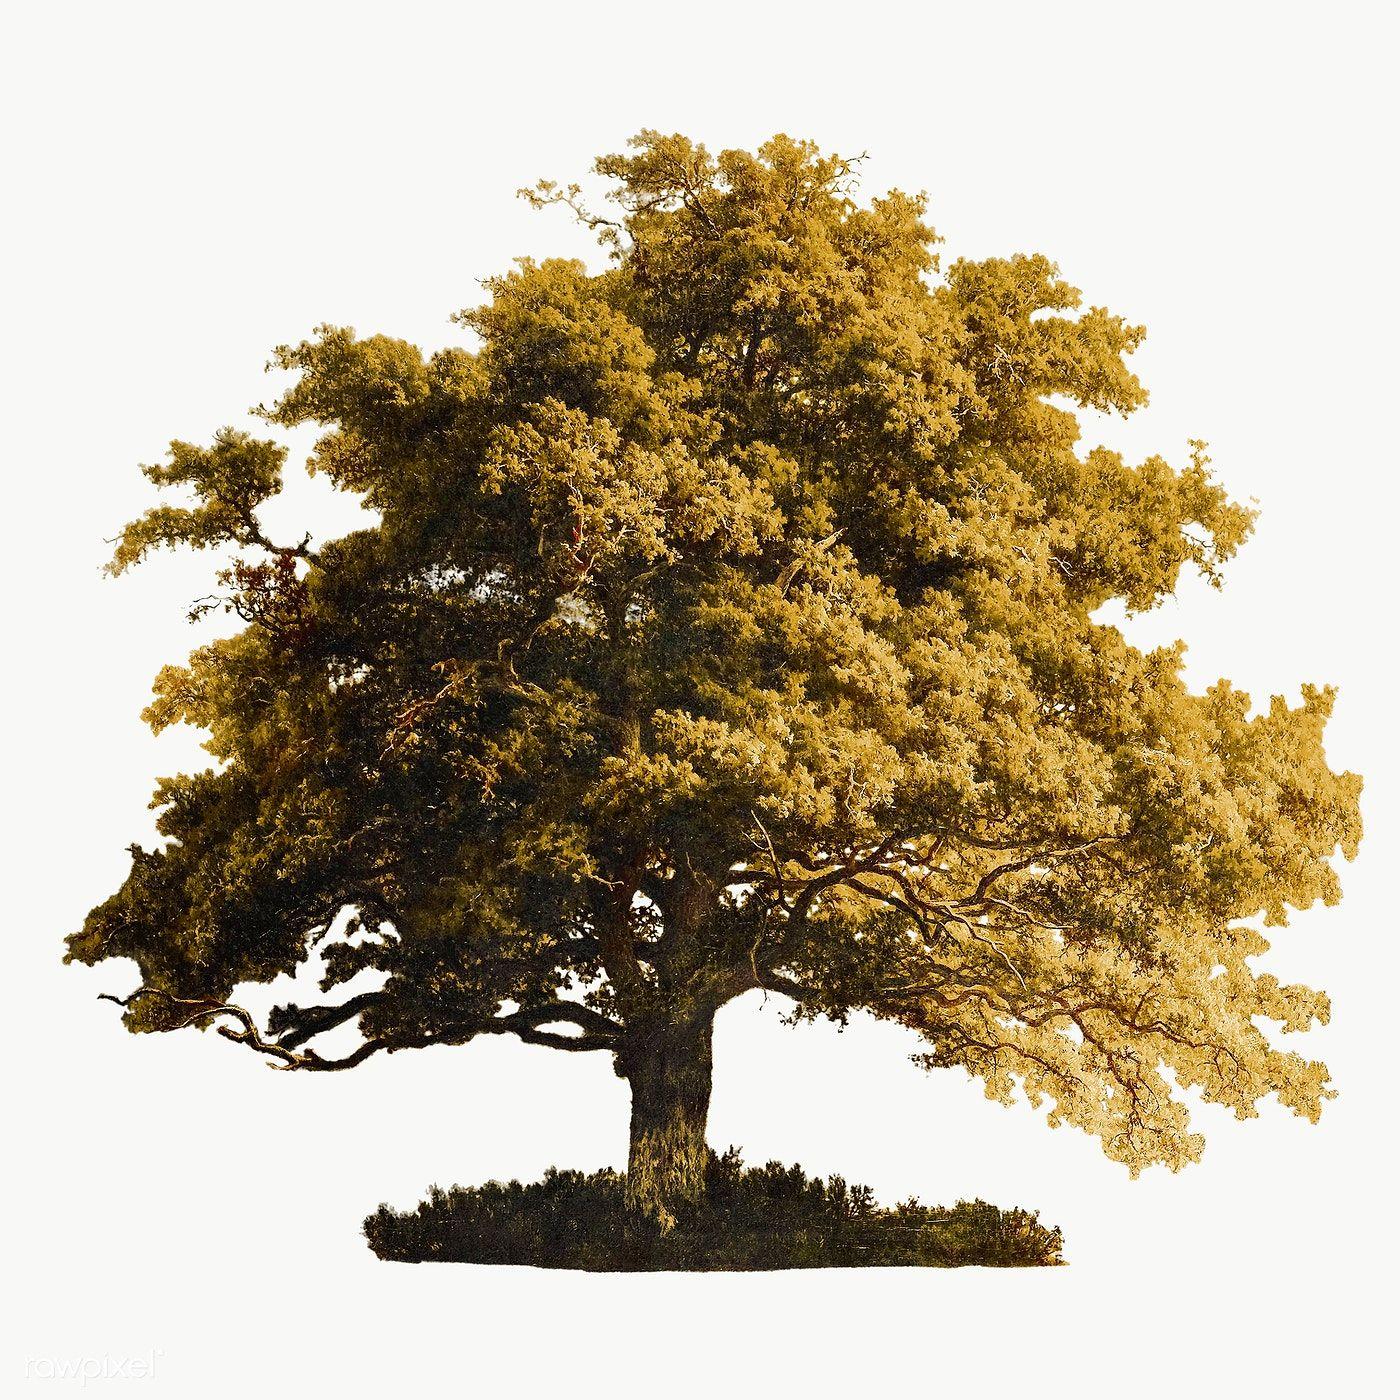 Vintage Oak Tree Illustration Transparent Png Premium Image By Rawpixel Com Eyeeyeview